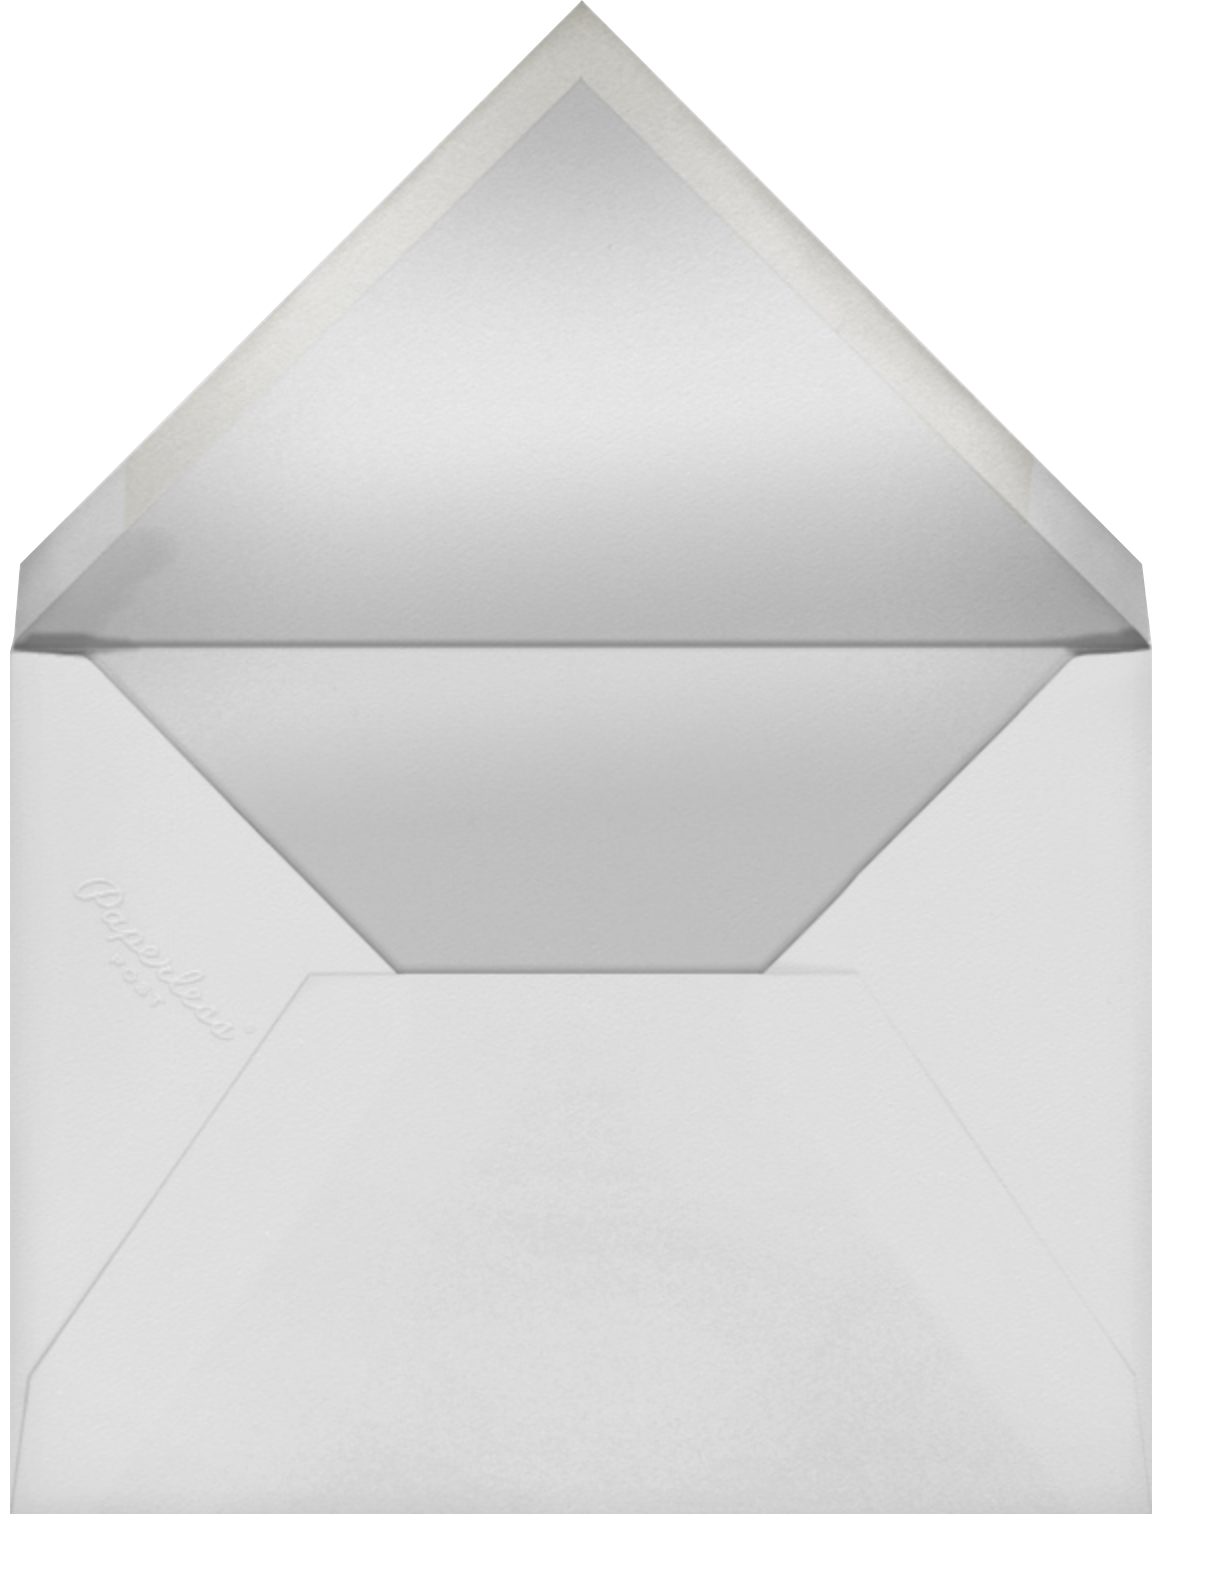 Gradient Bars - Pink - Paperless Post - Adult birthday - envelope back